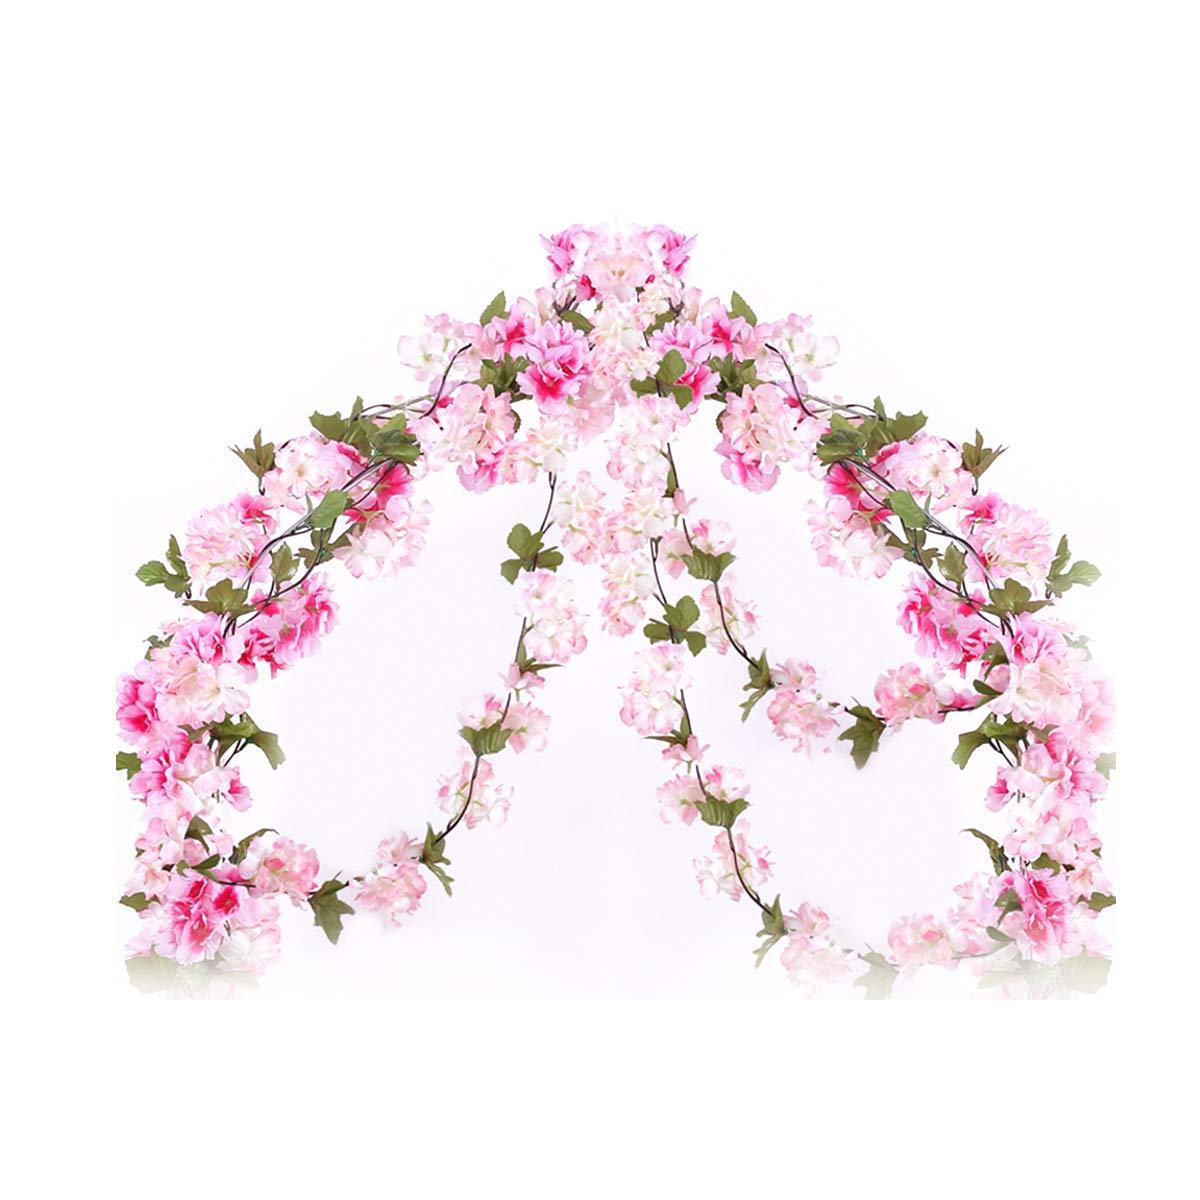 Li Hua猫ローズガーランド人工ローズVine withグリーンLeaves 63 Inchパックof 3花ガーランドホームウェディング装飾 ピンク B075WTSFXG Yh-light Pink